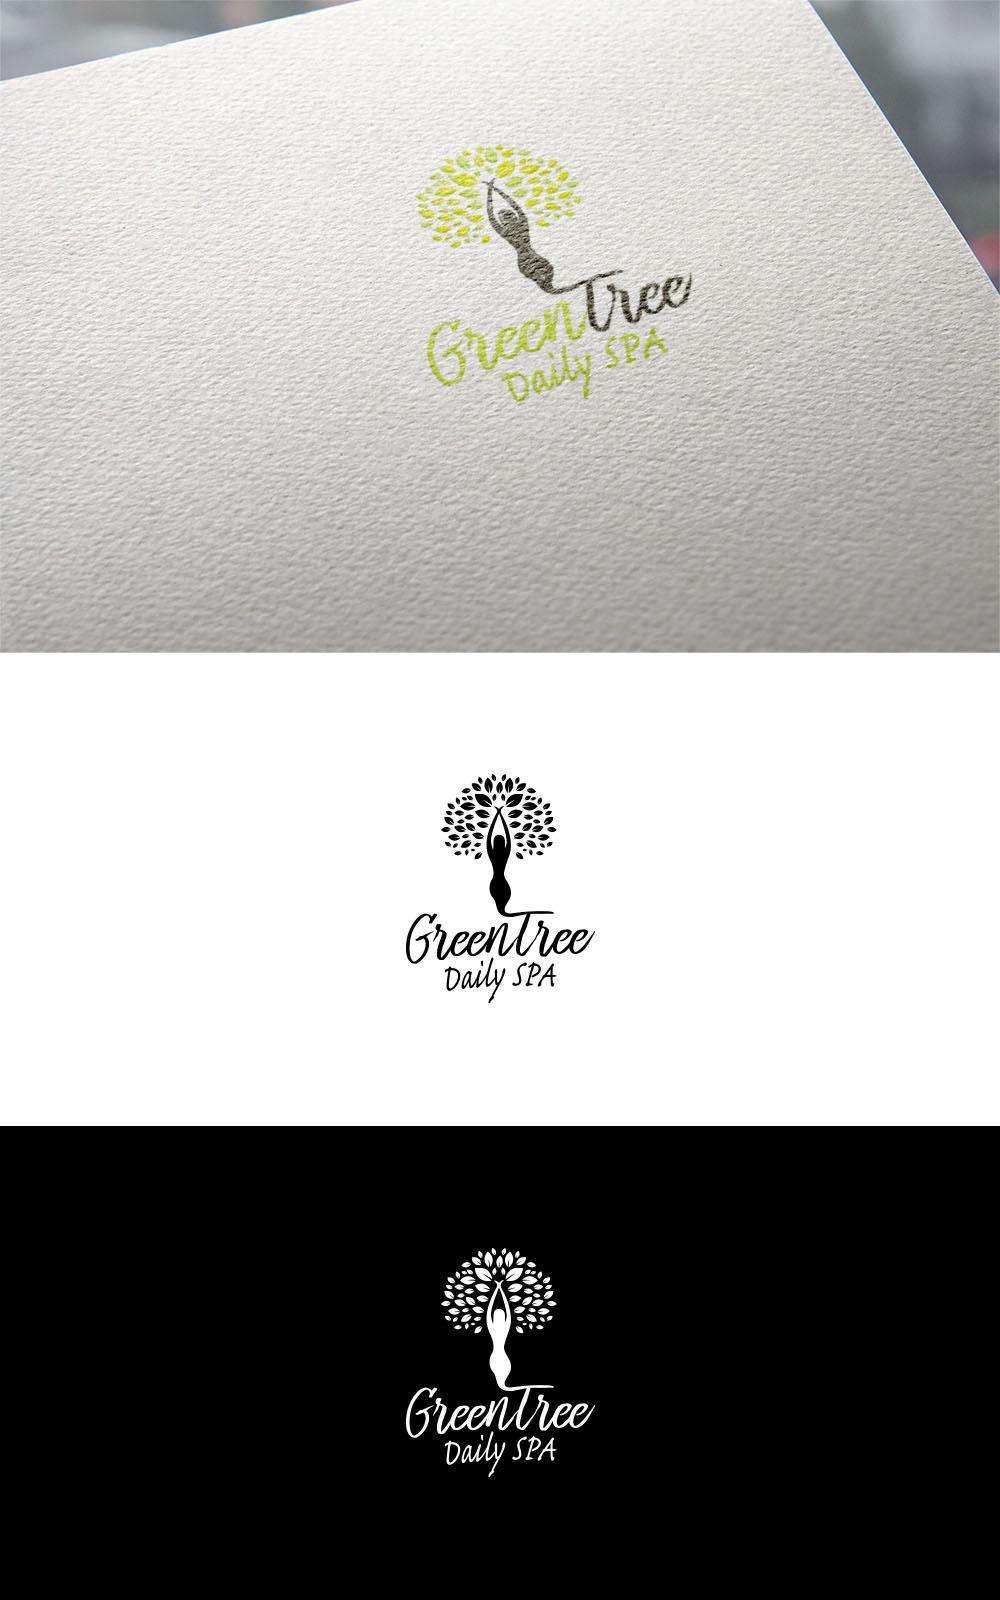 Greentree_content_01